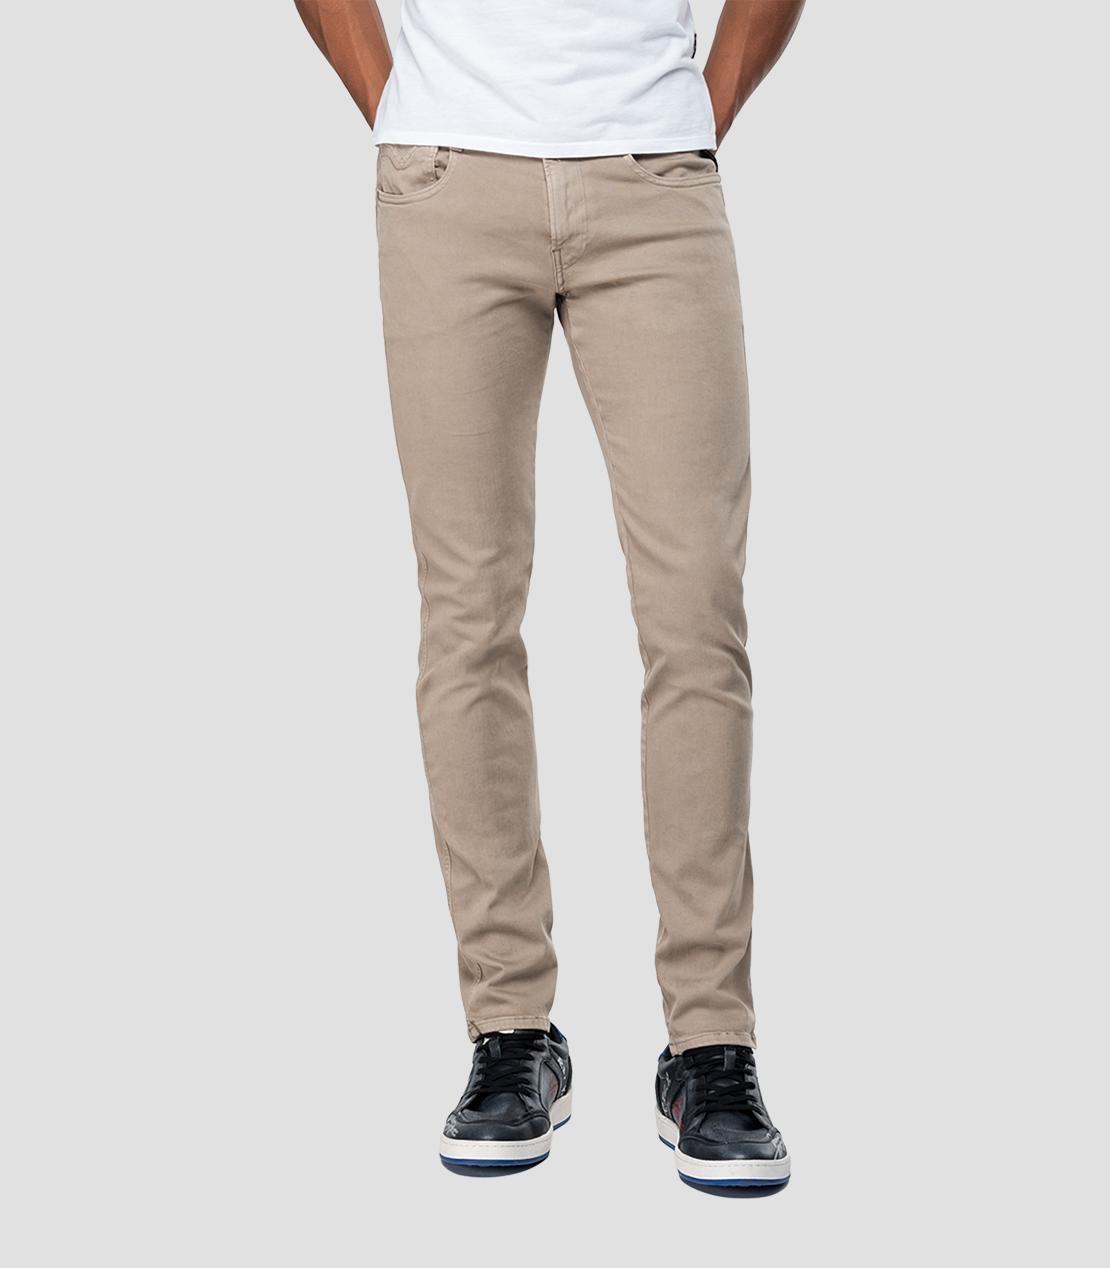 REPLAY jean coupe slim hyperflex-1